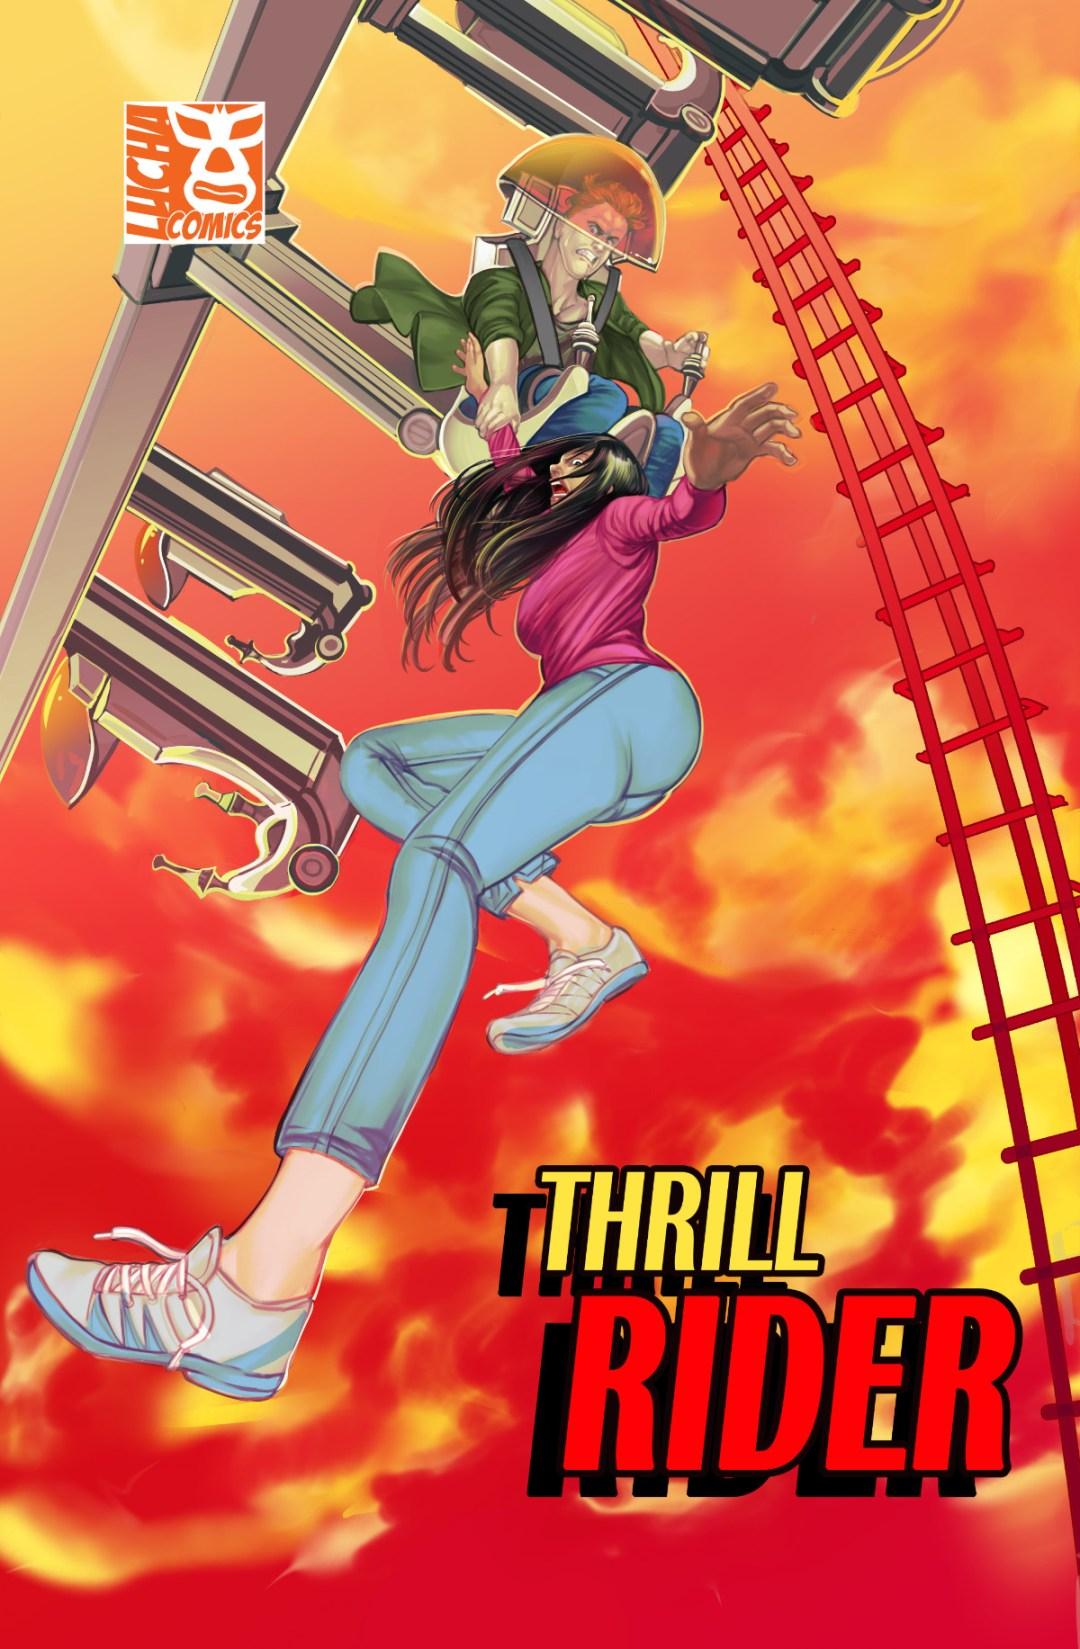 Lucha Comics - Thrill Rider Cover